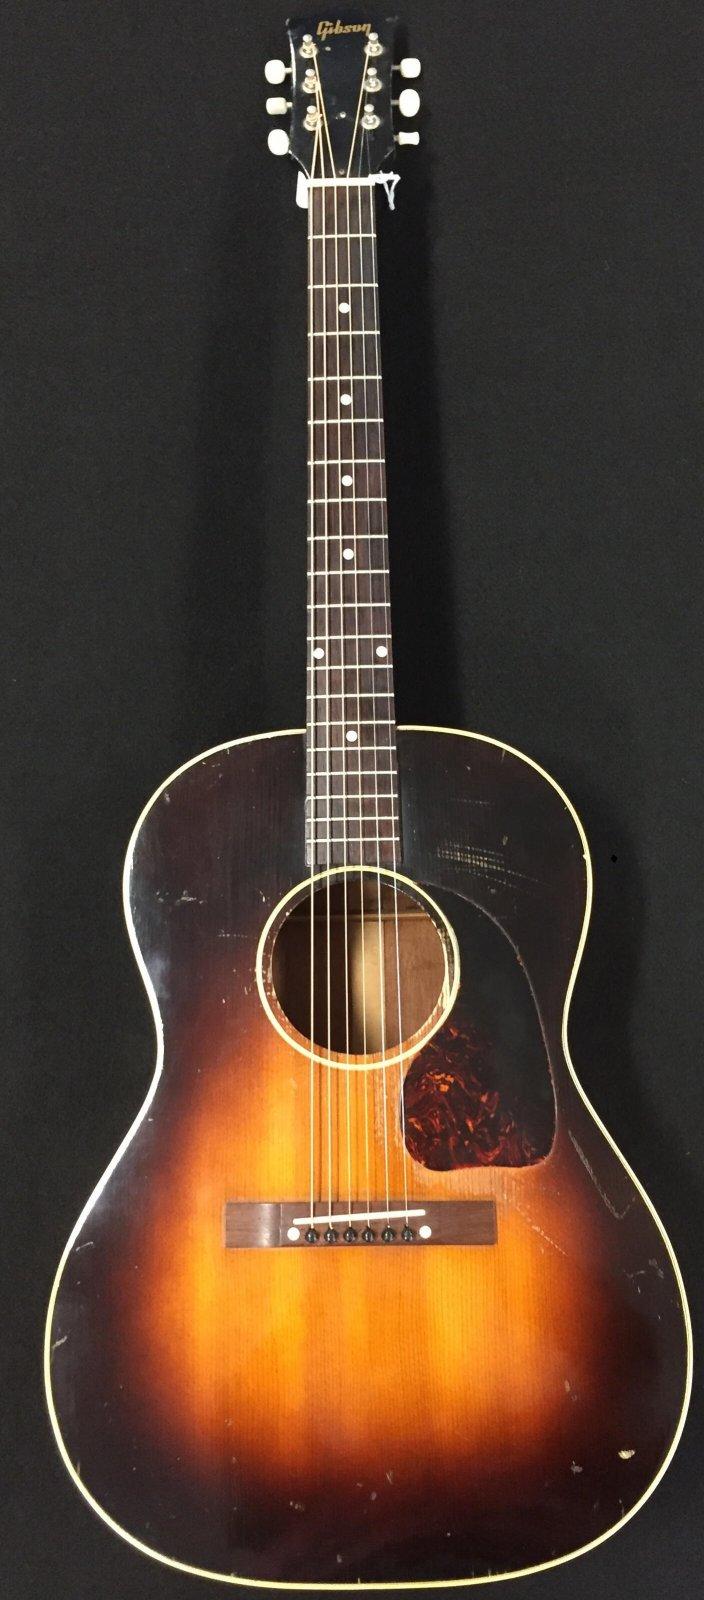 Gibson LG-2 vintage 1953